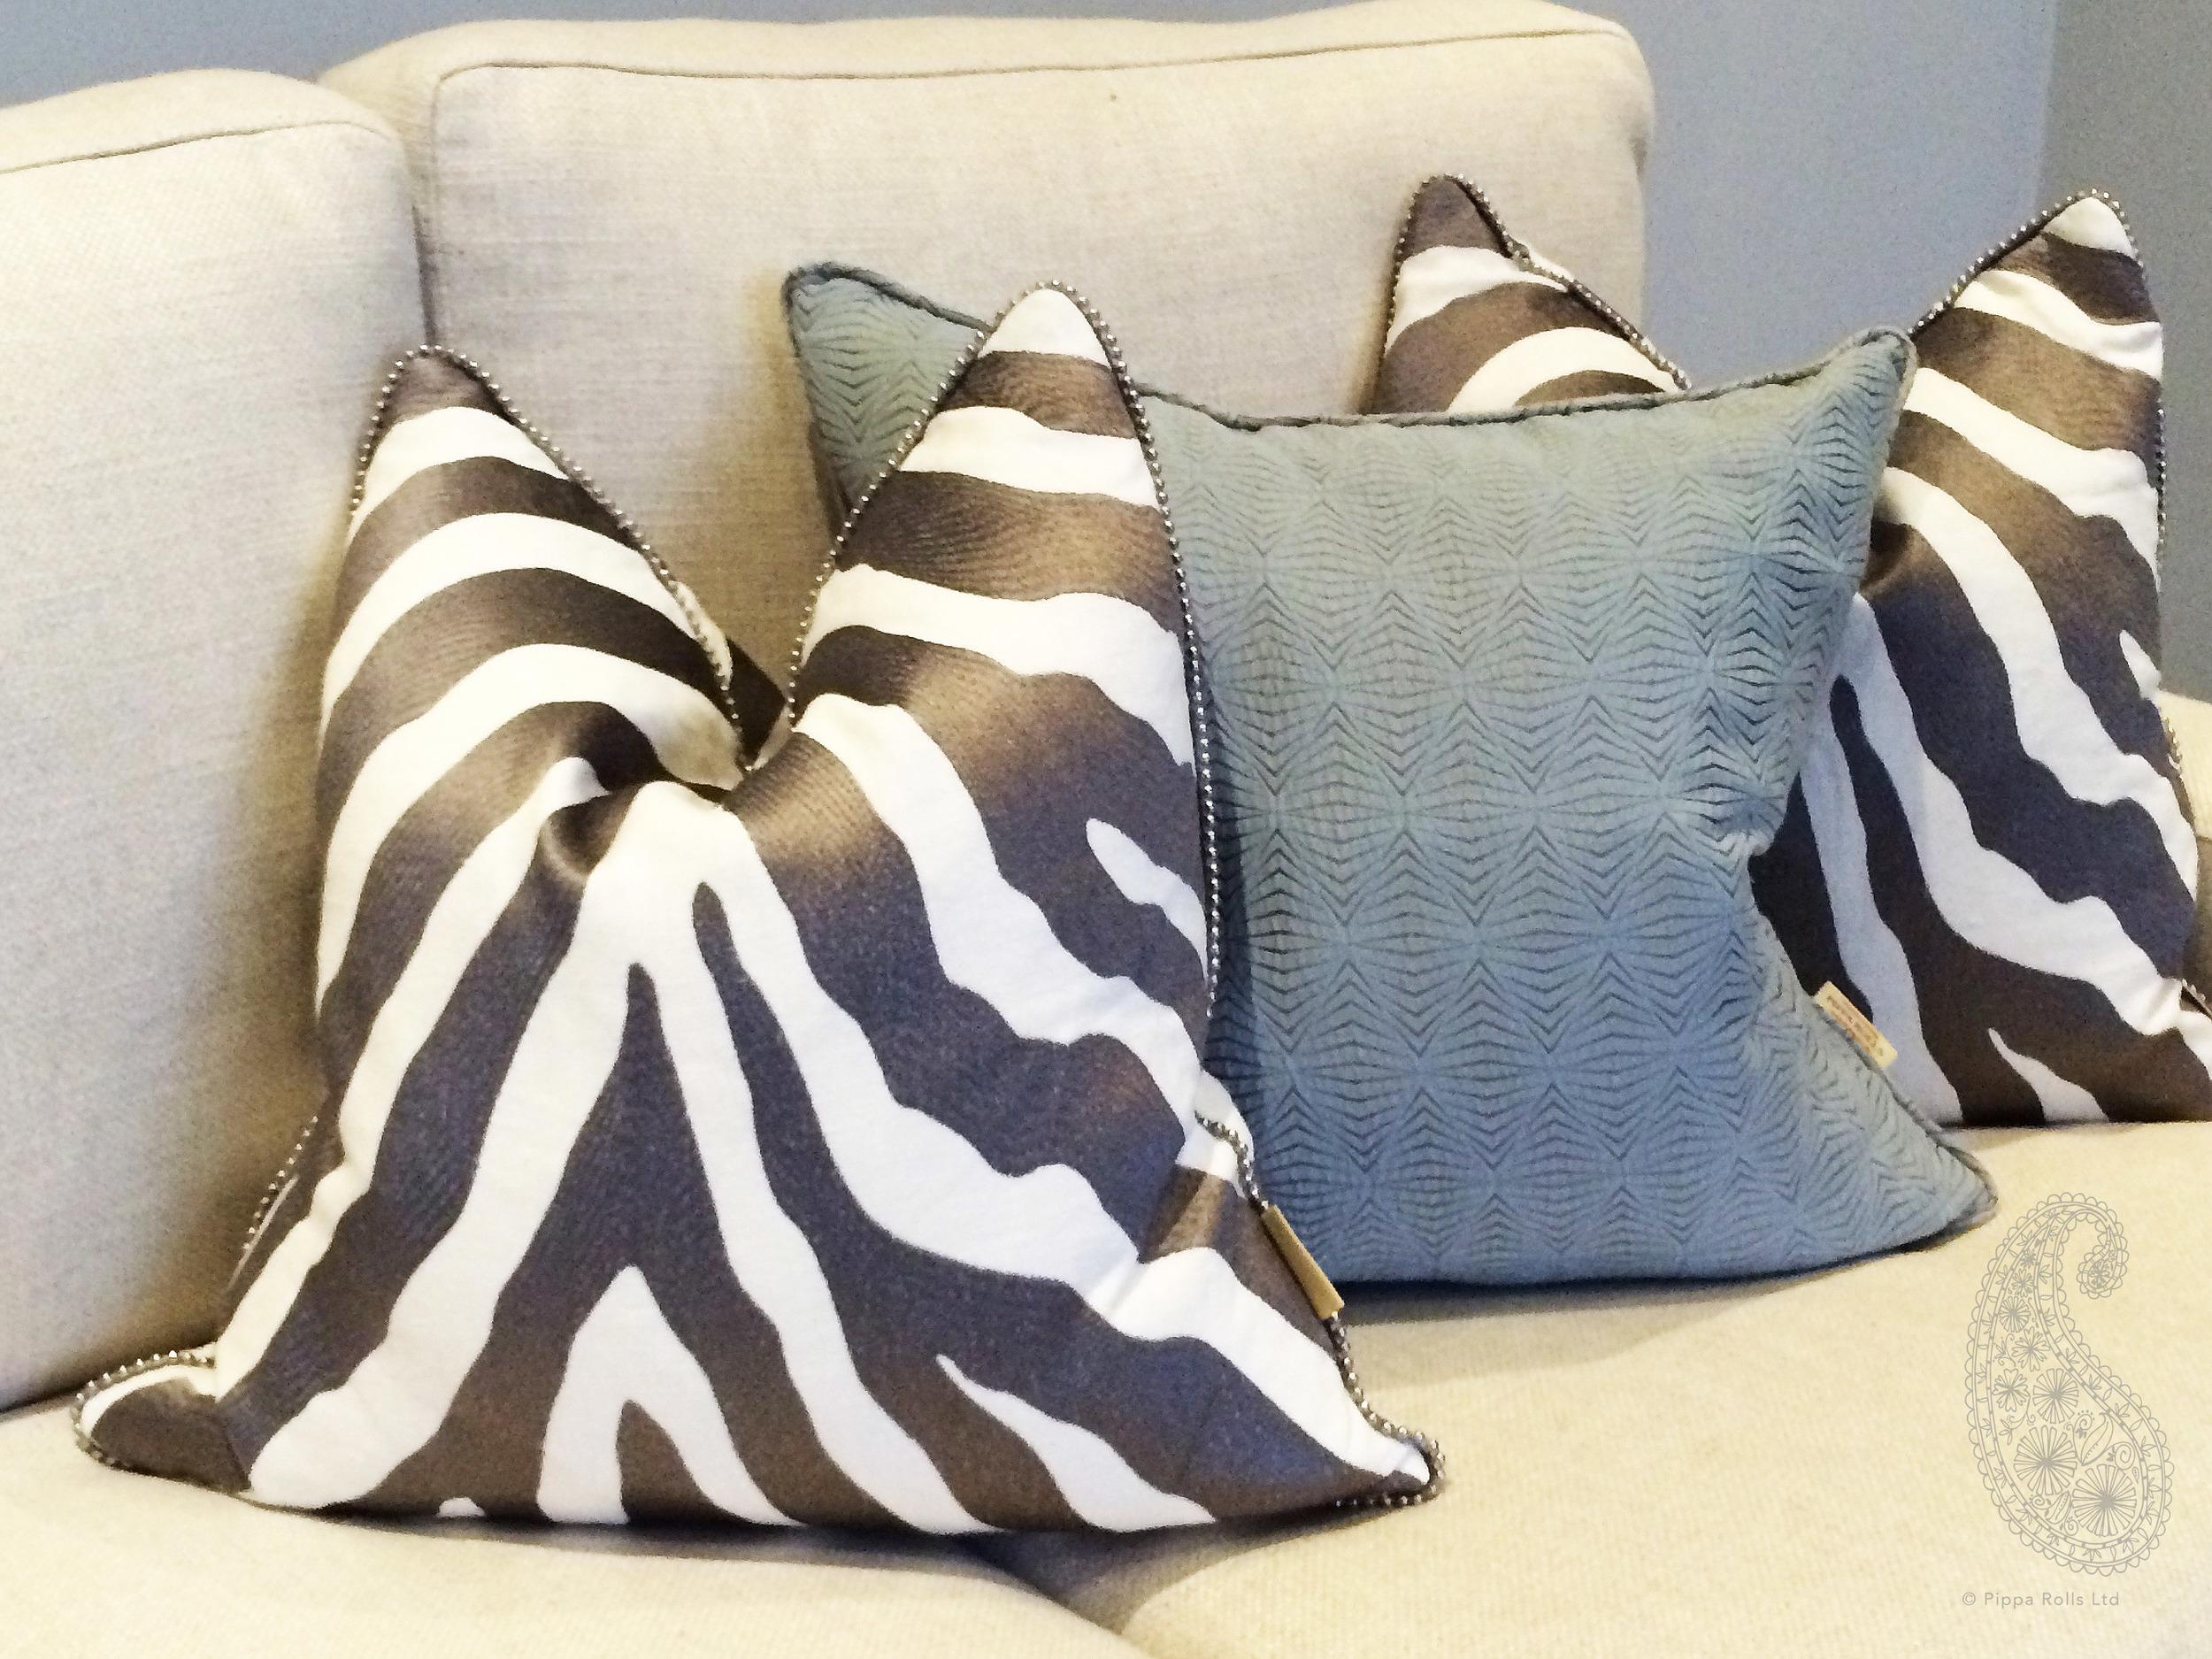 Zebra strip cushions by Pippa Rolls Limited jpeg copy.jpg